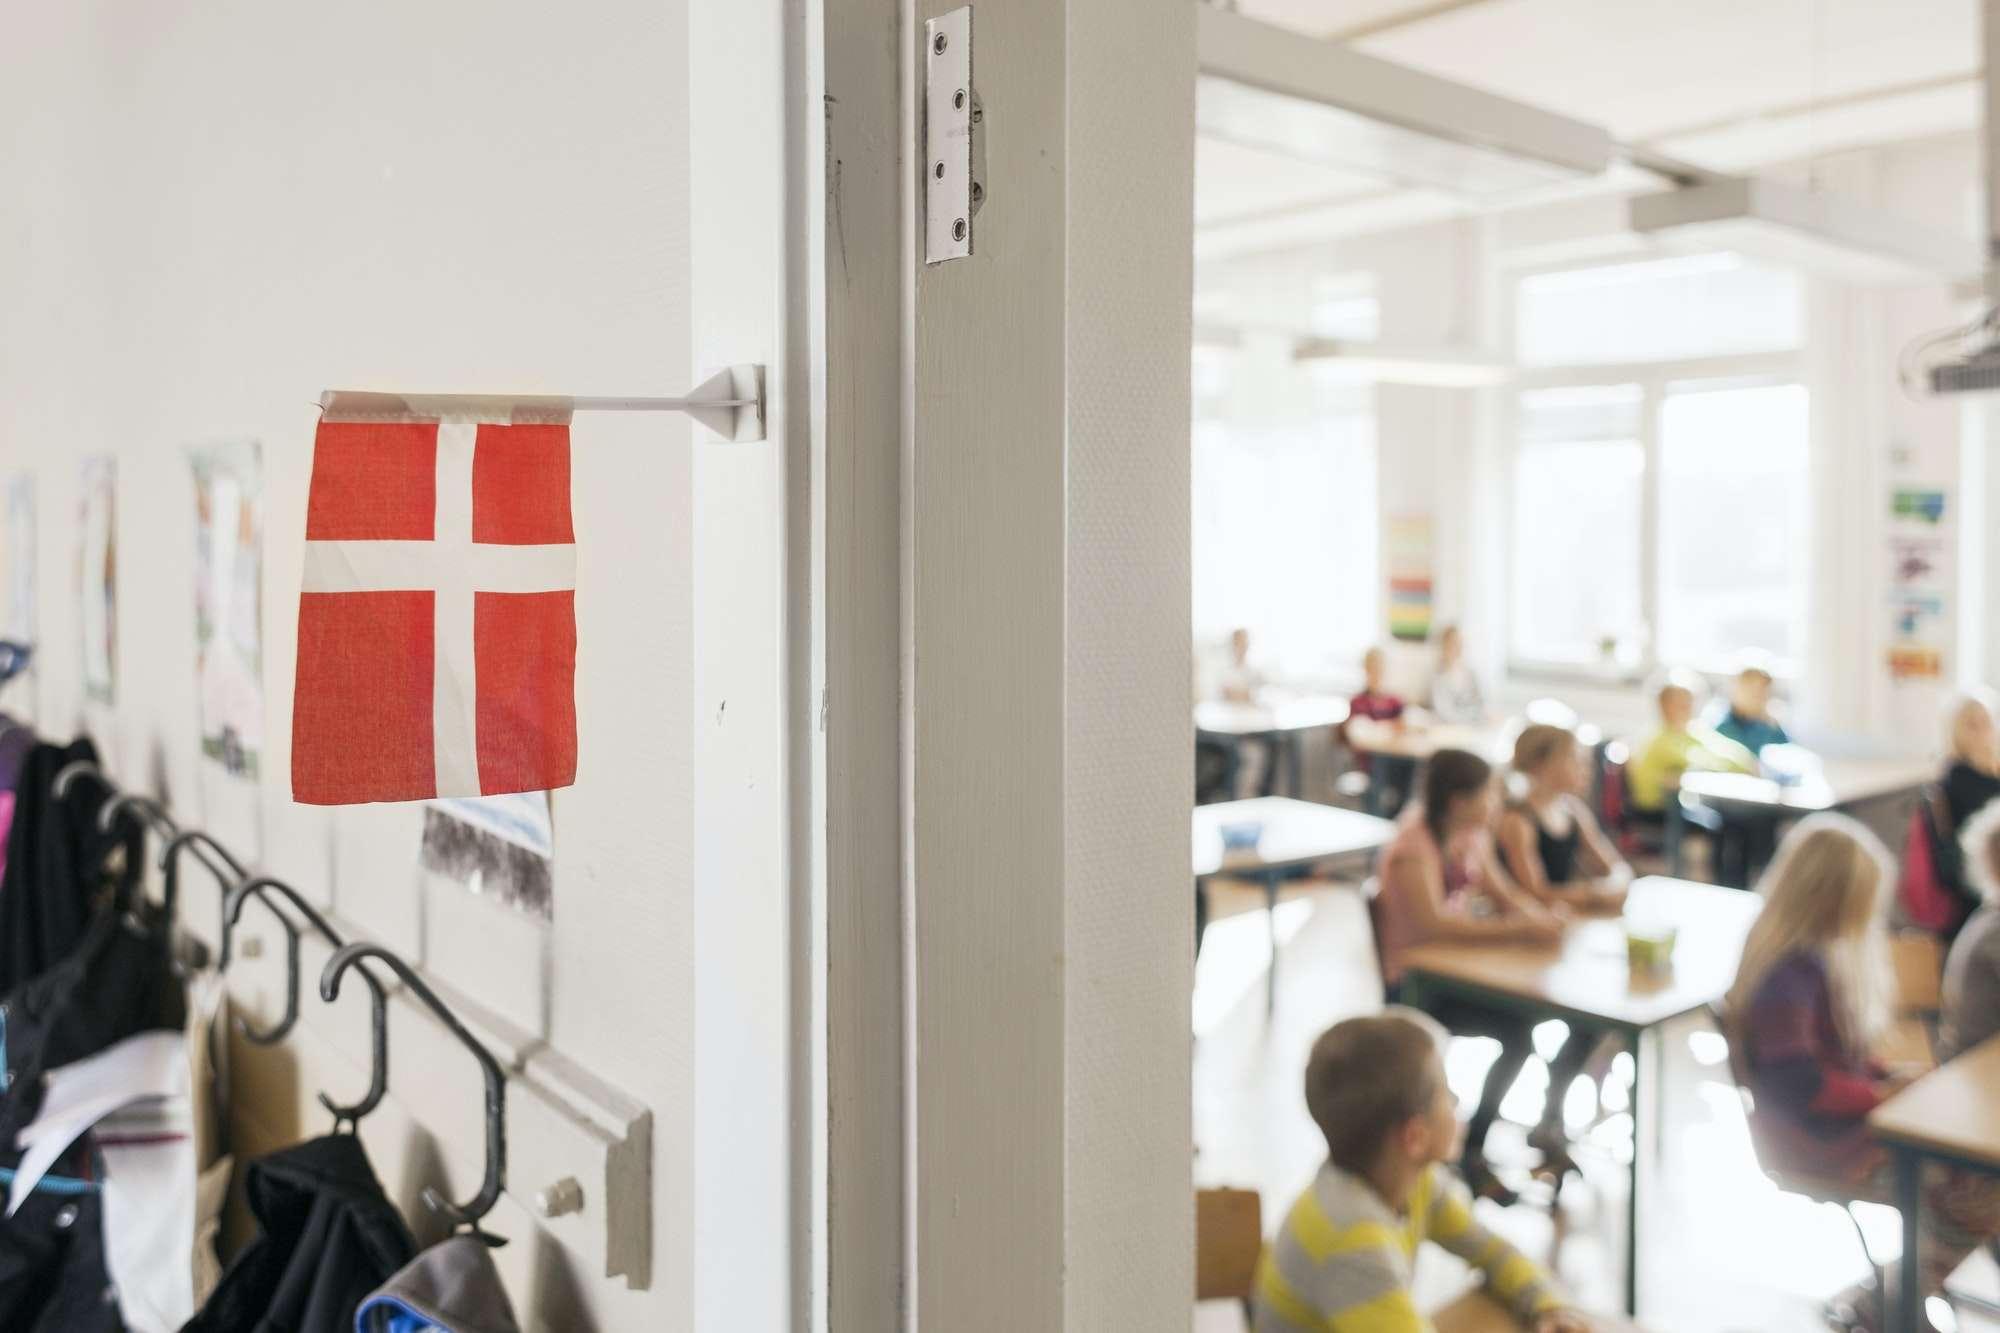 Denmark Flag outside classroom